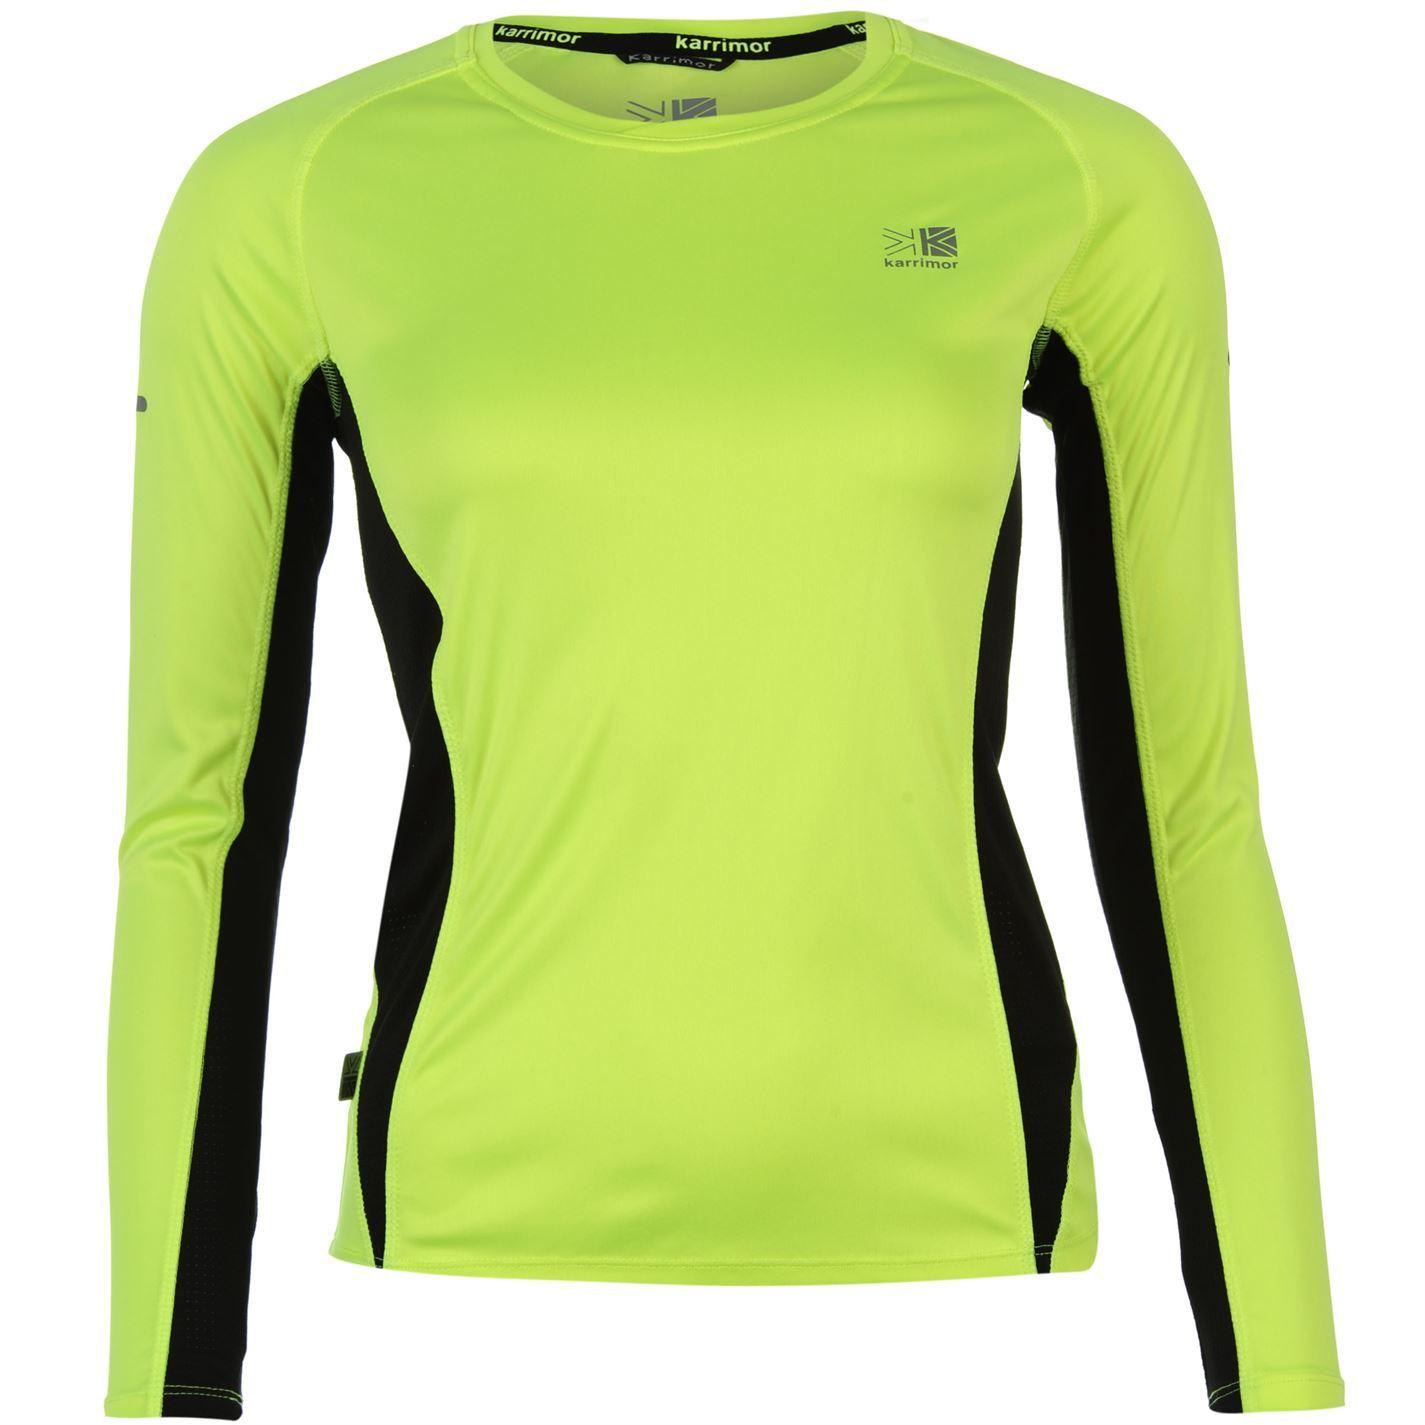 Karrimor womens ladies clothing long sleeve running for Misses long sleeve tee shirts